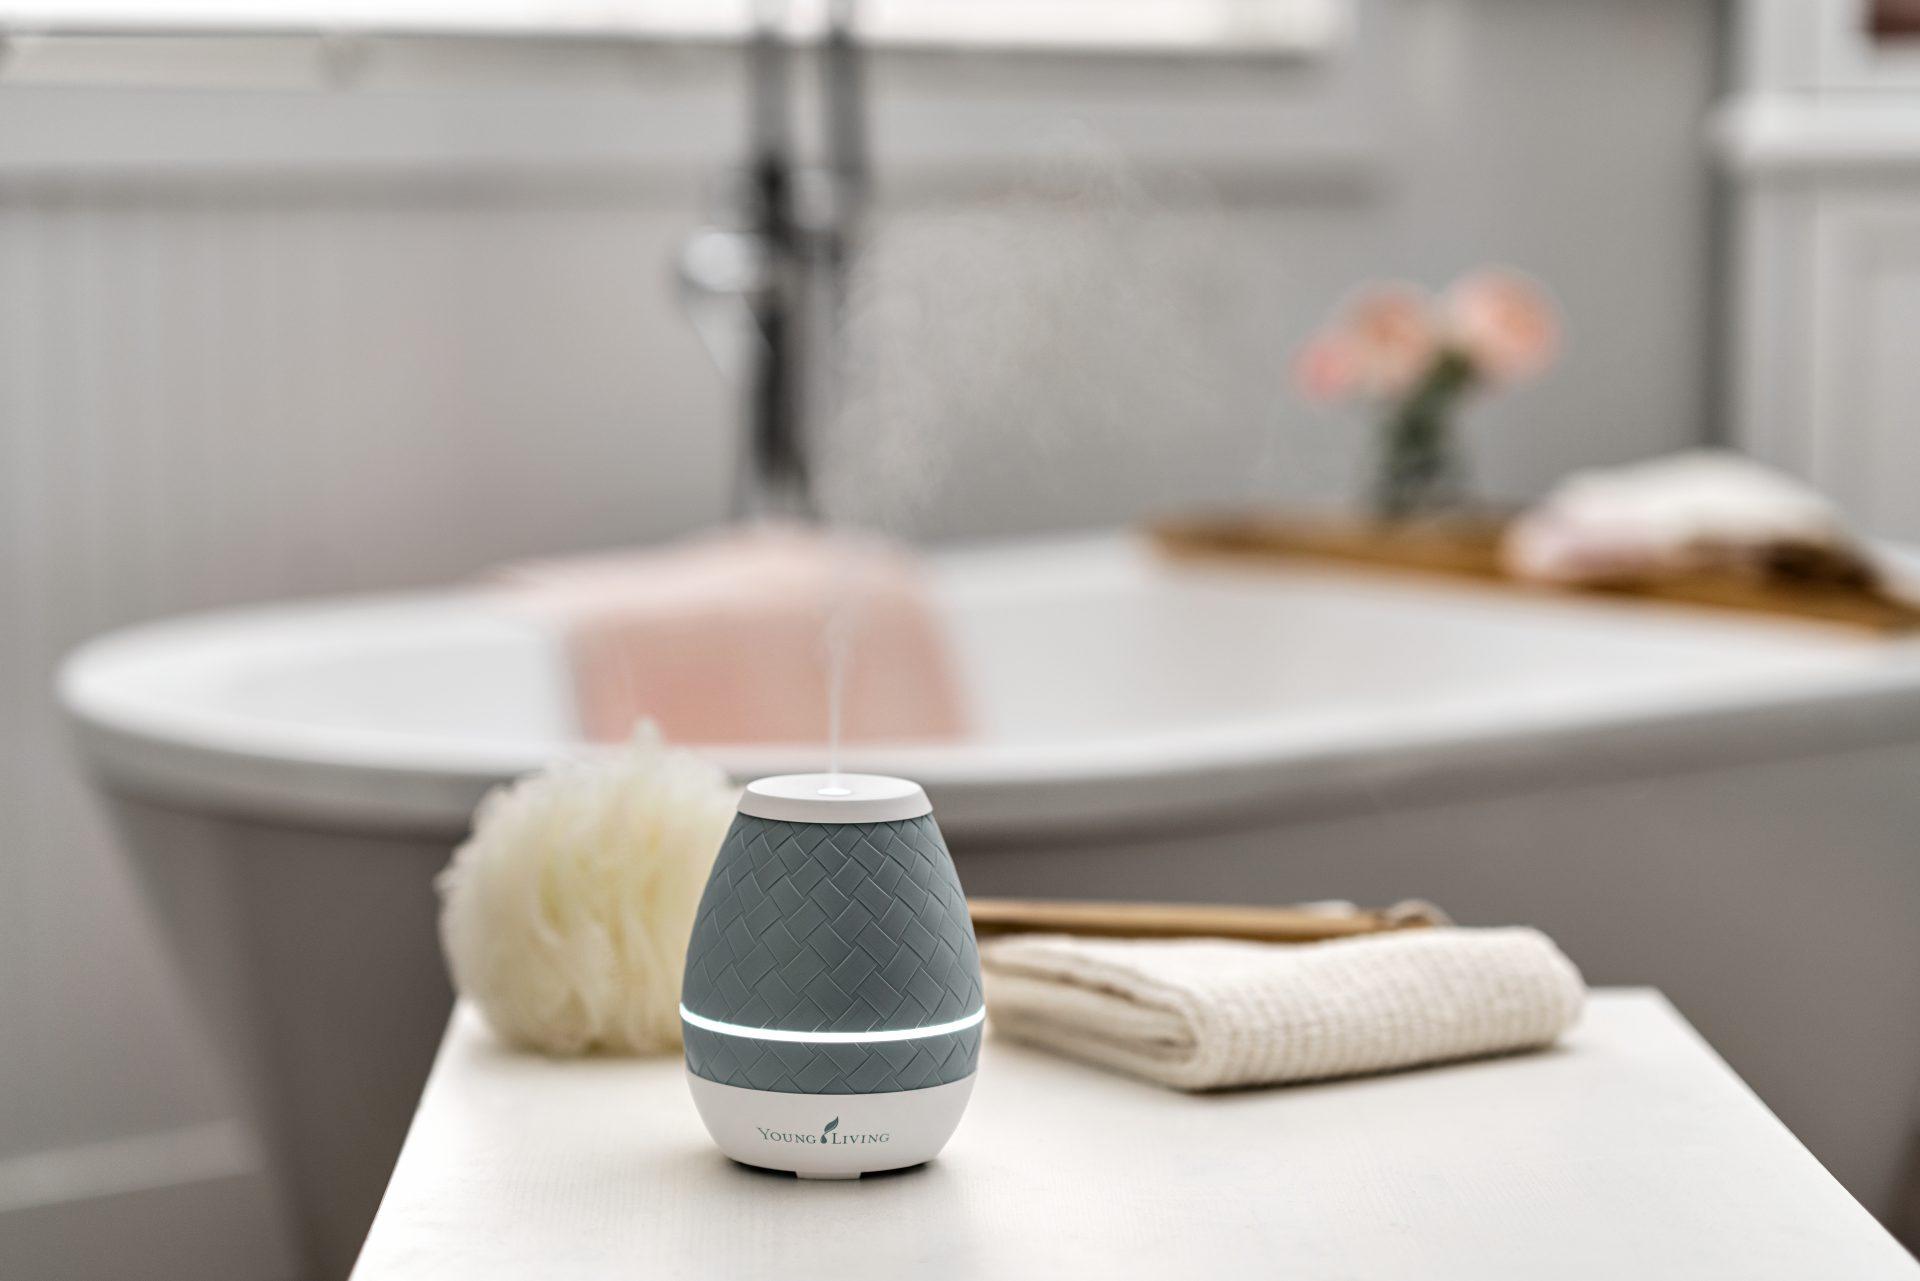 Sweet Aroma diffuser